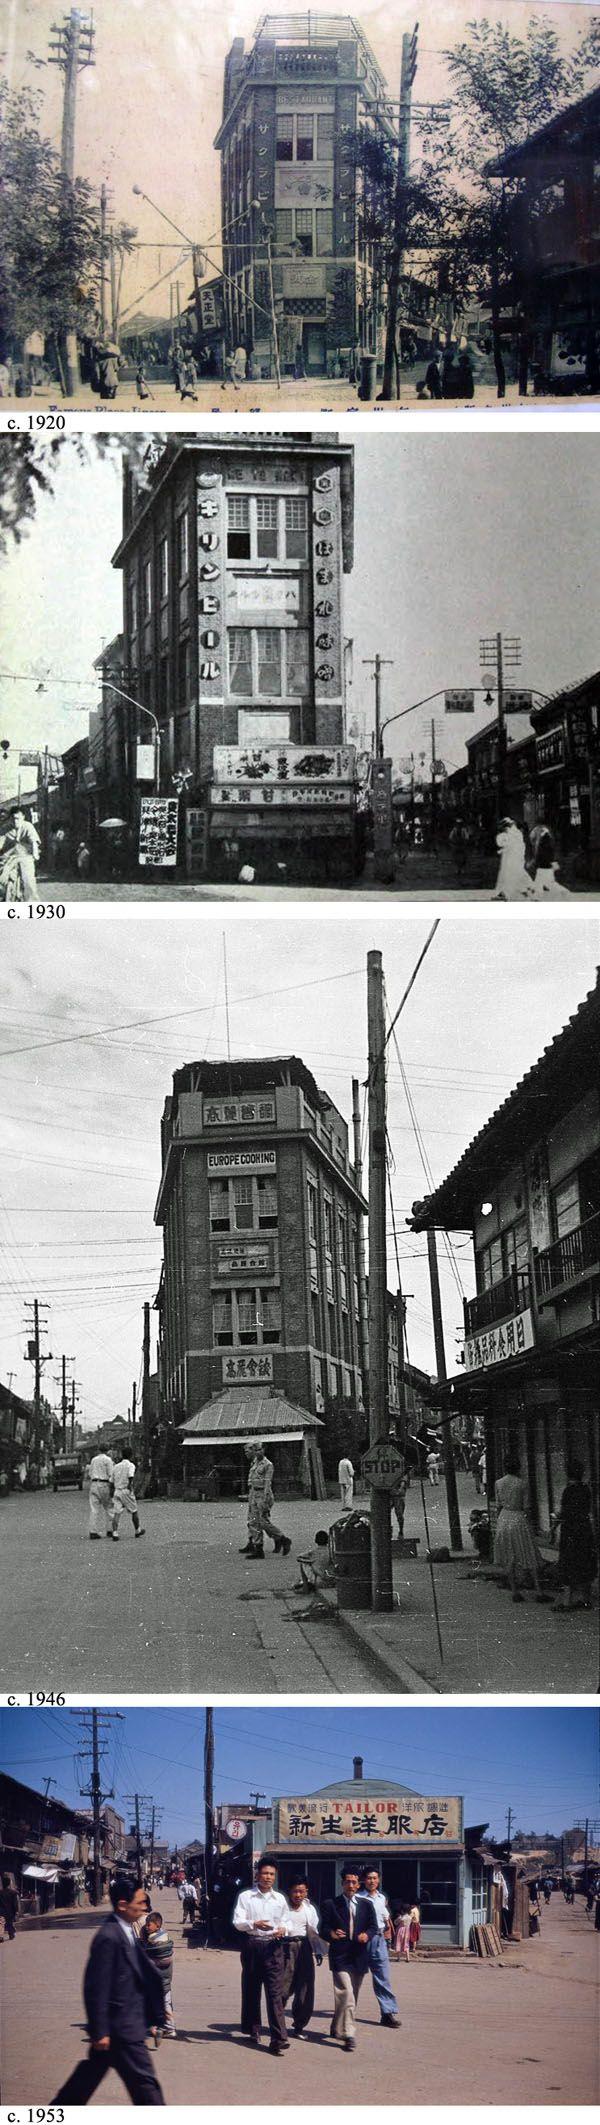 Same corner in Incheon 1920s through 1950s